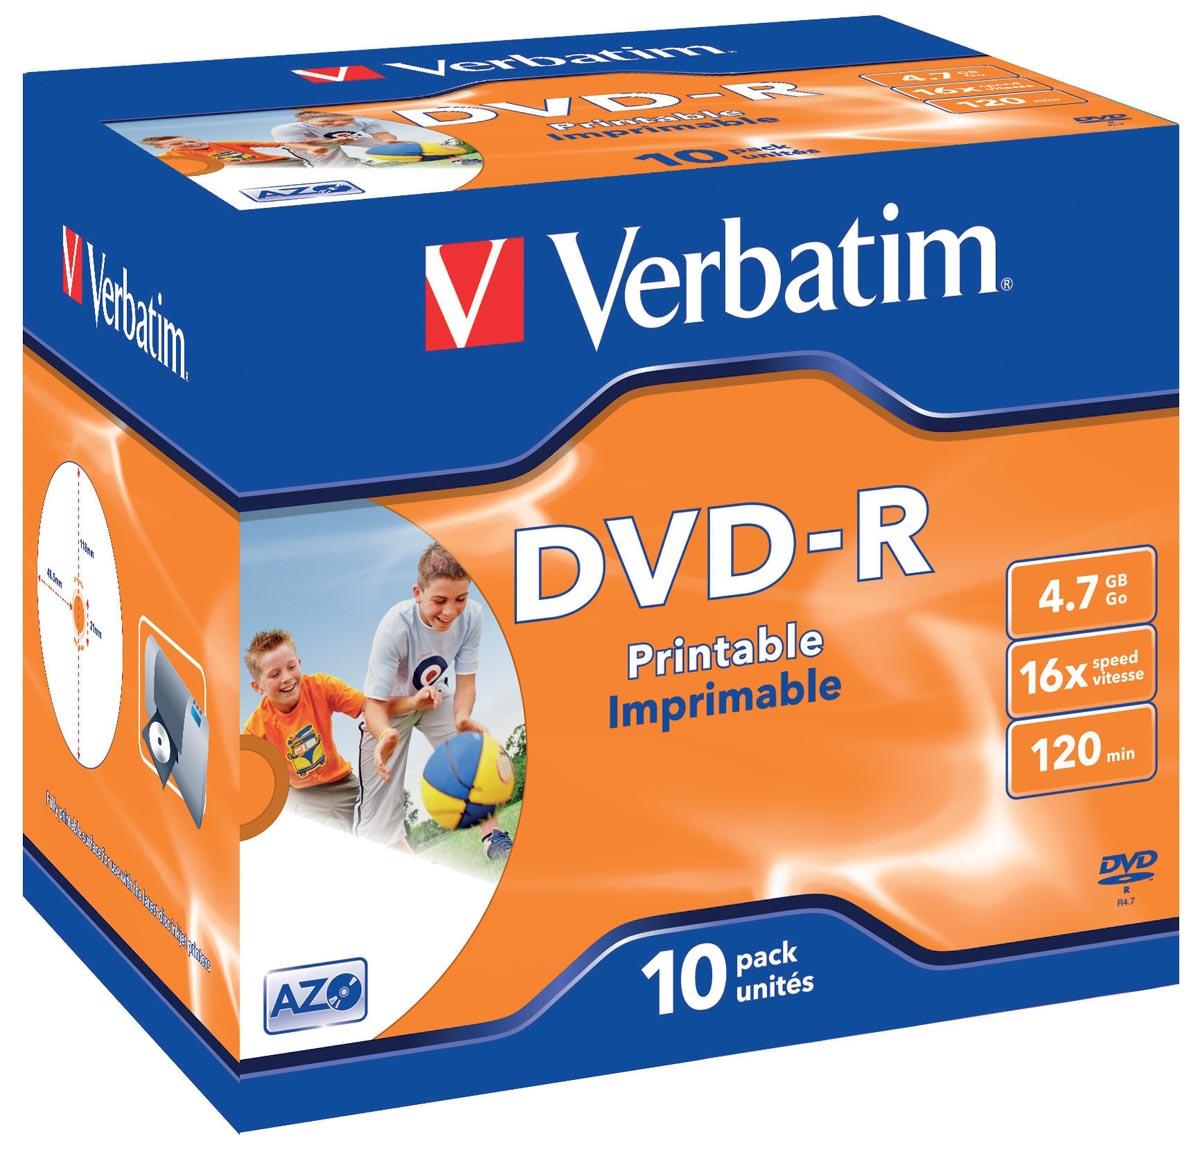 1x10 DVD-R 47GB 16x Speed Jewel Case printable